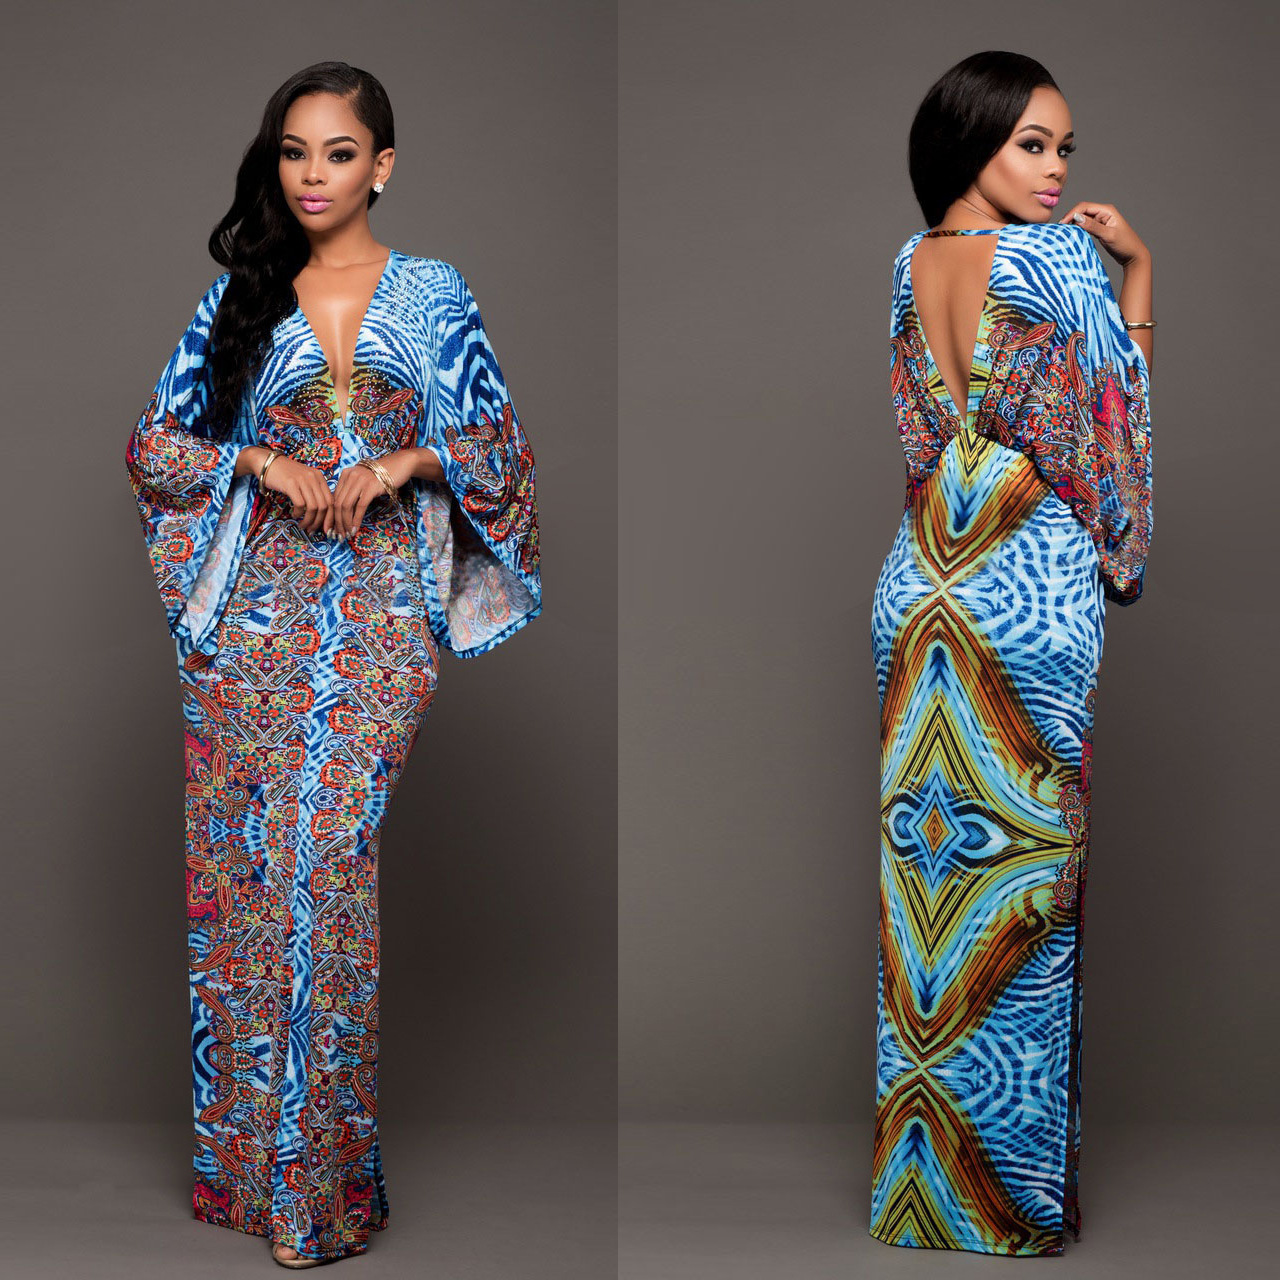 Robe Africaine Moderne >> Mode Africaine 2017